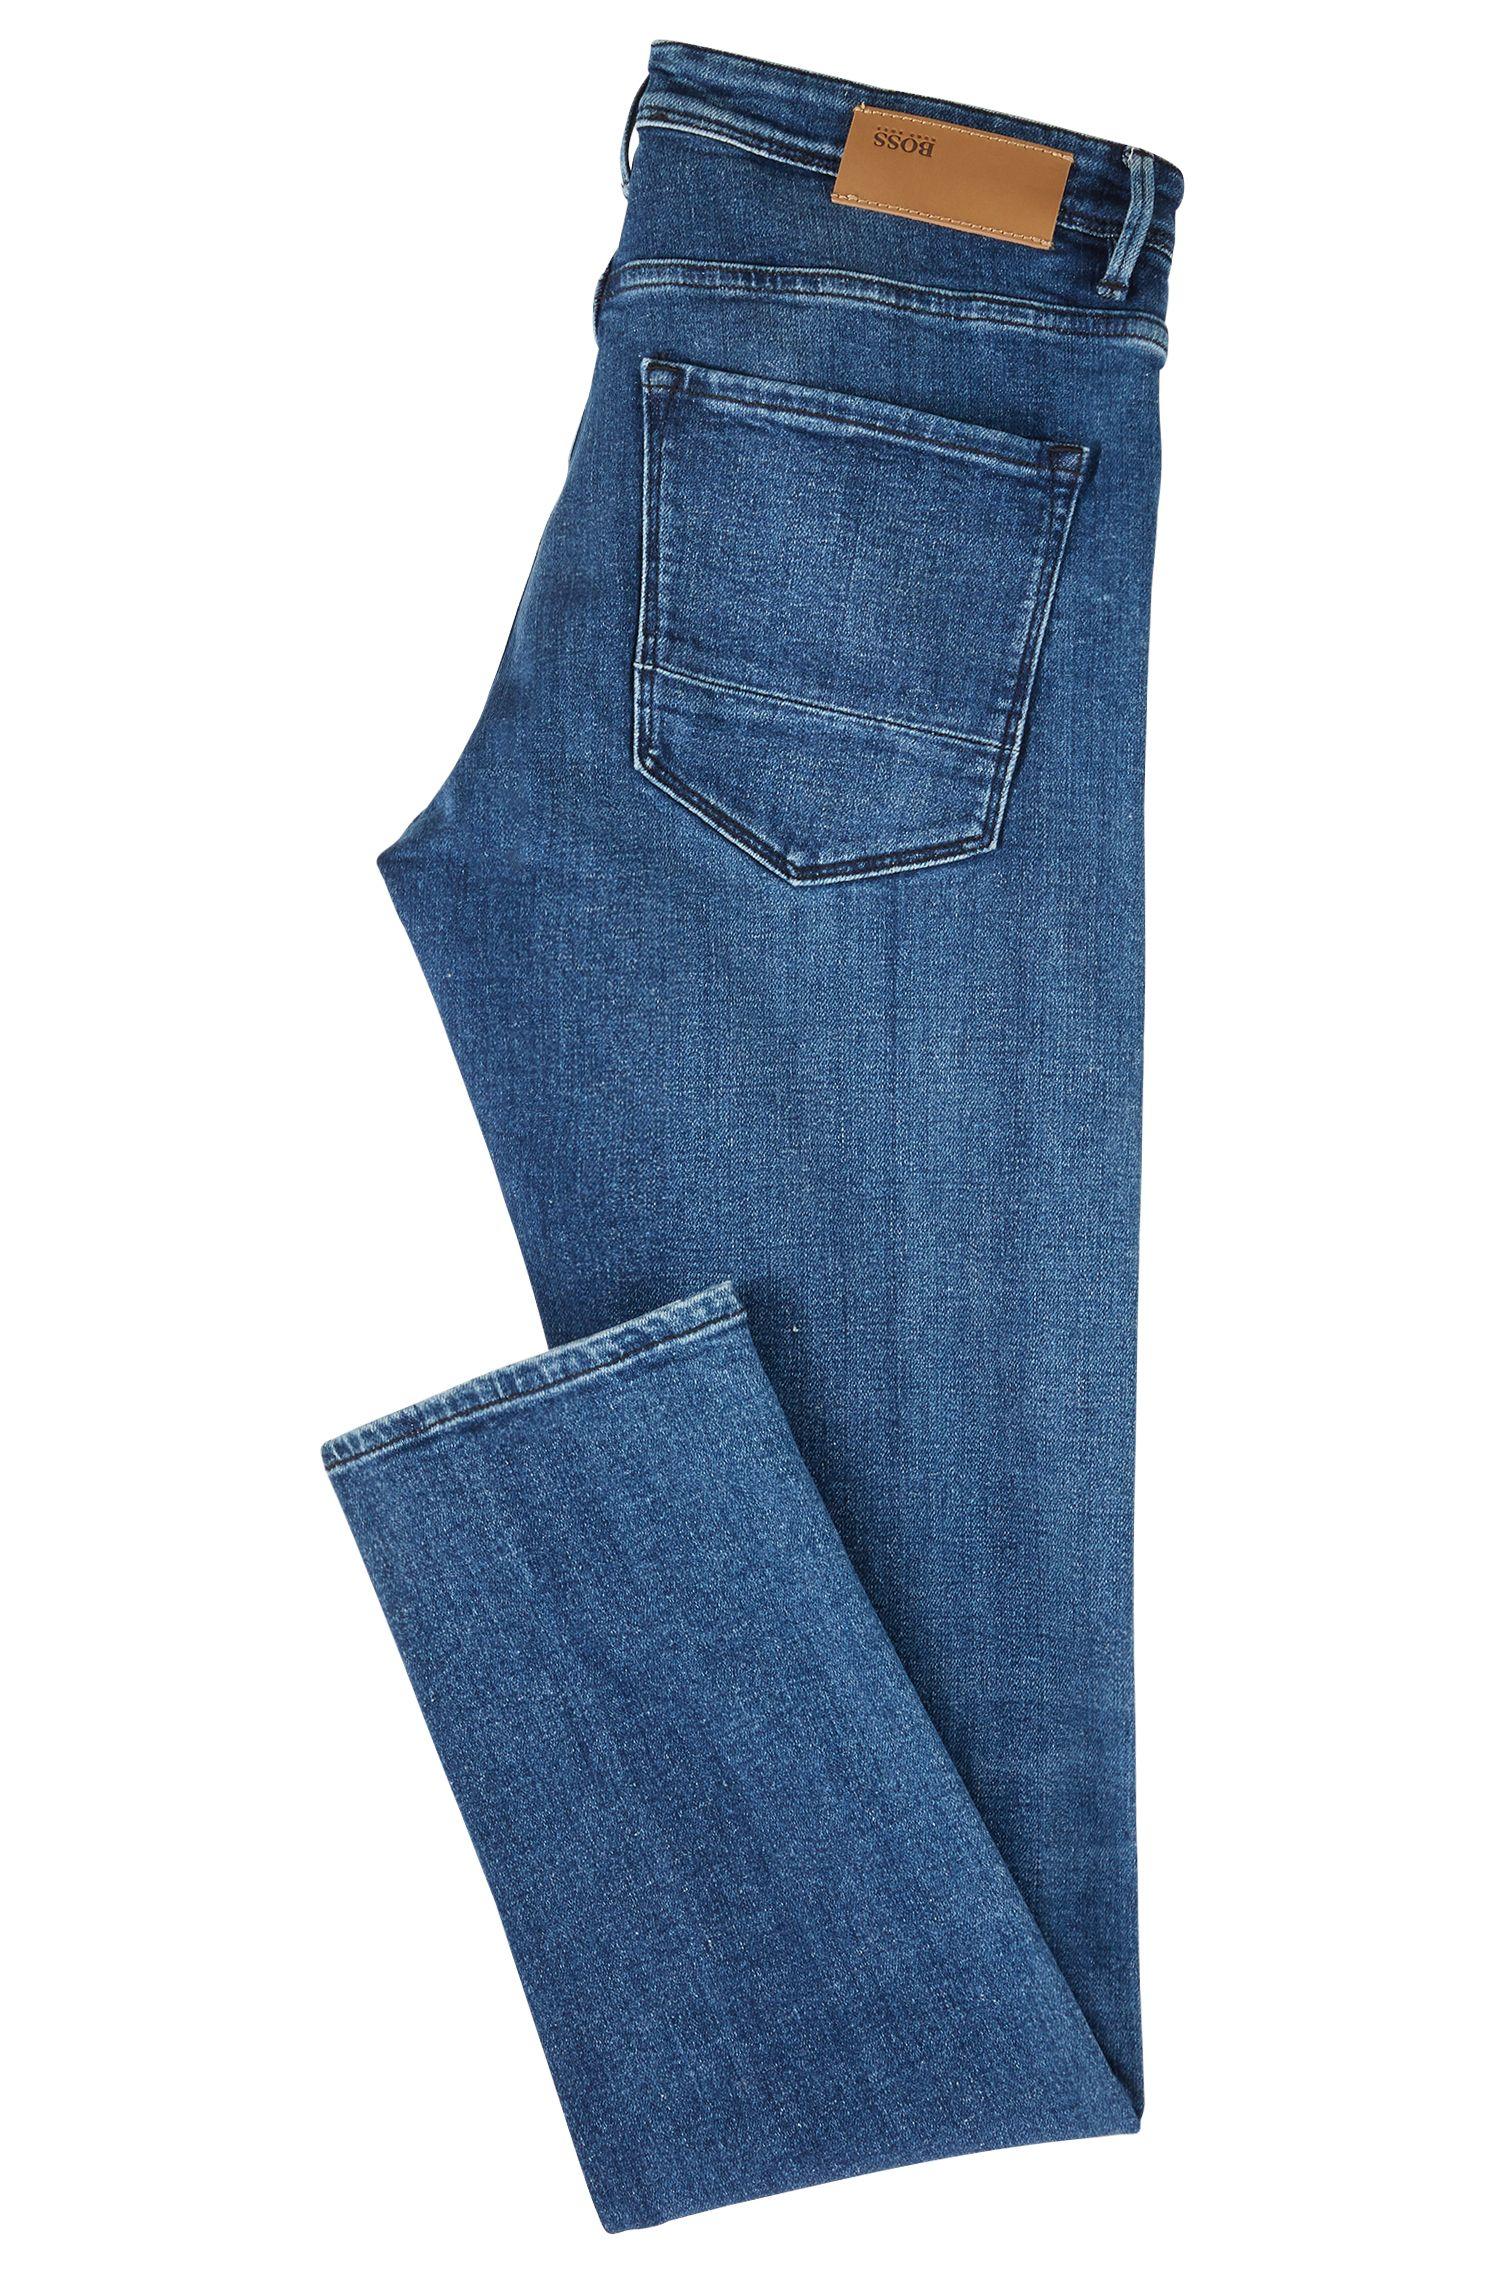 Jean Extra Slim Fit en denim selvedge stretch italien, Bleu